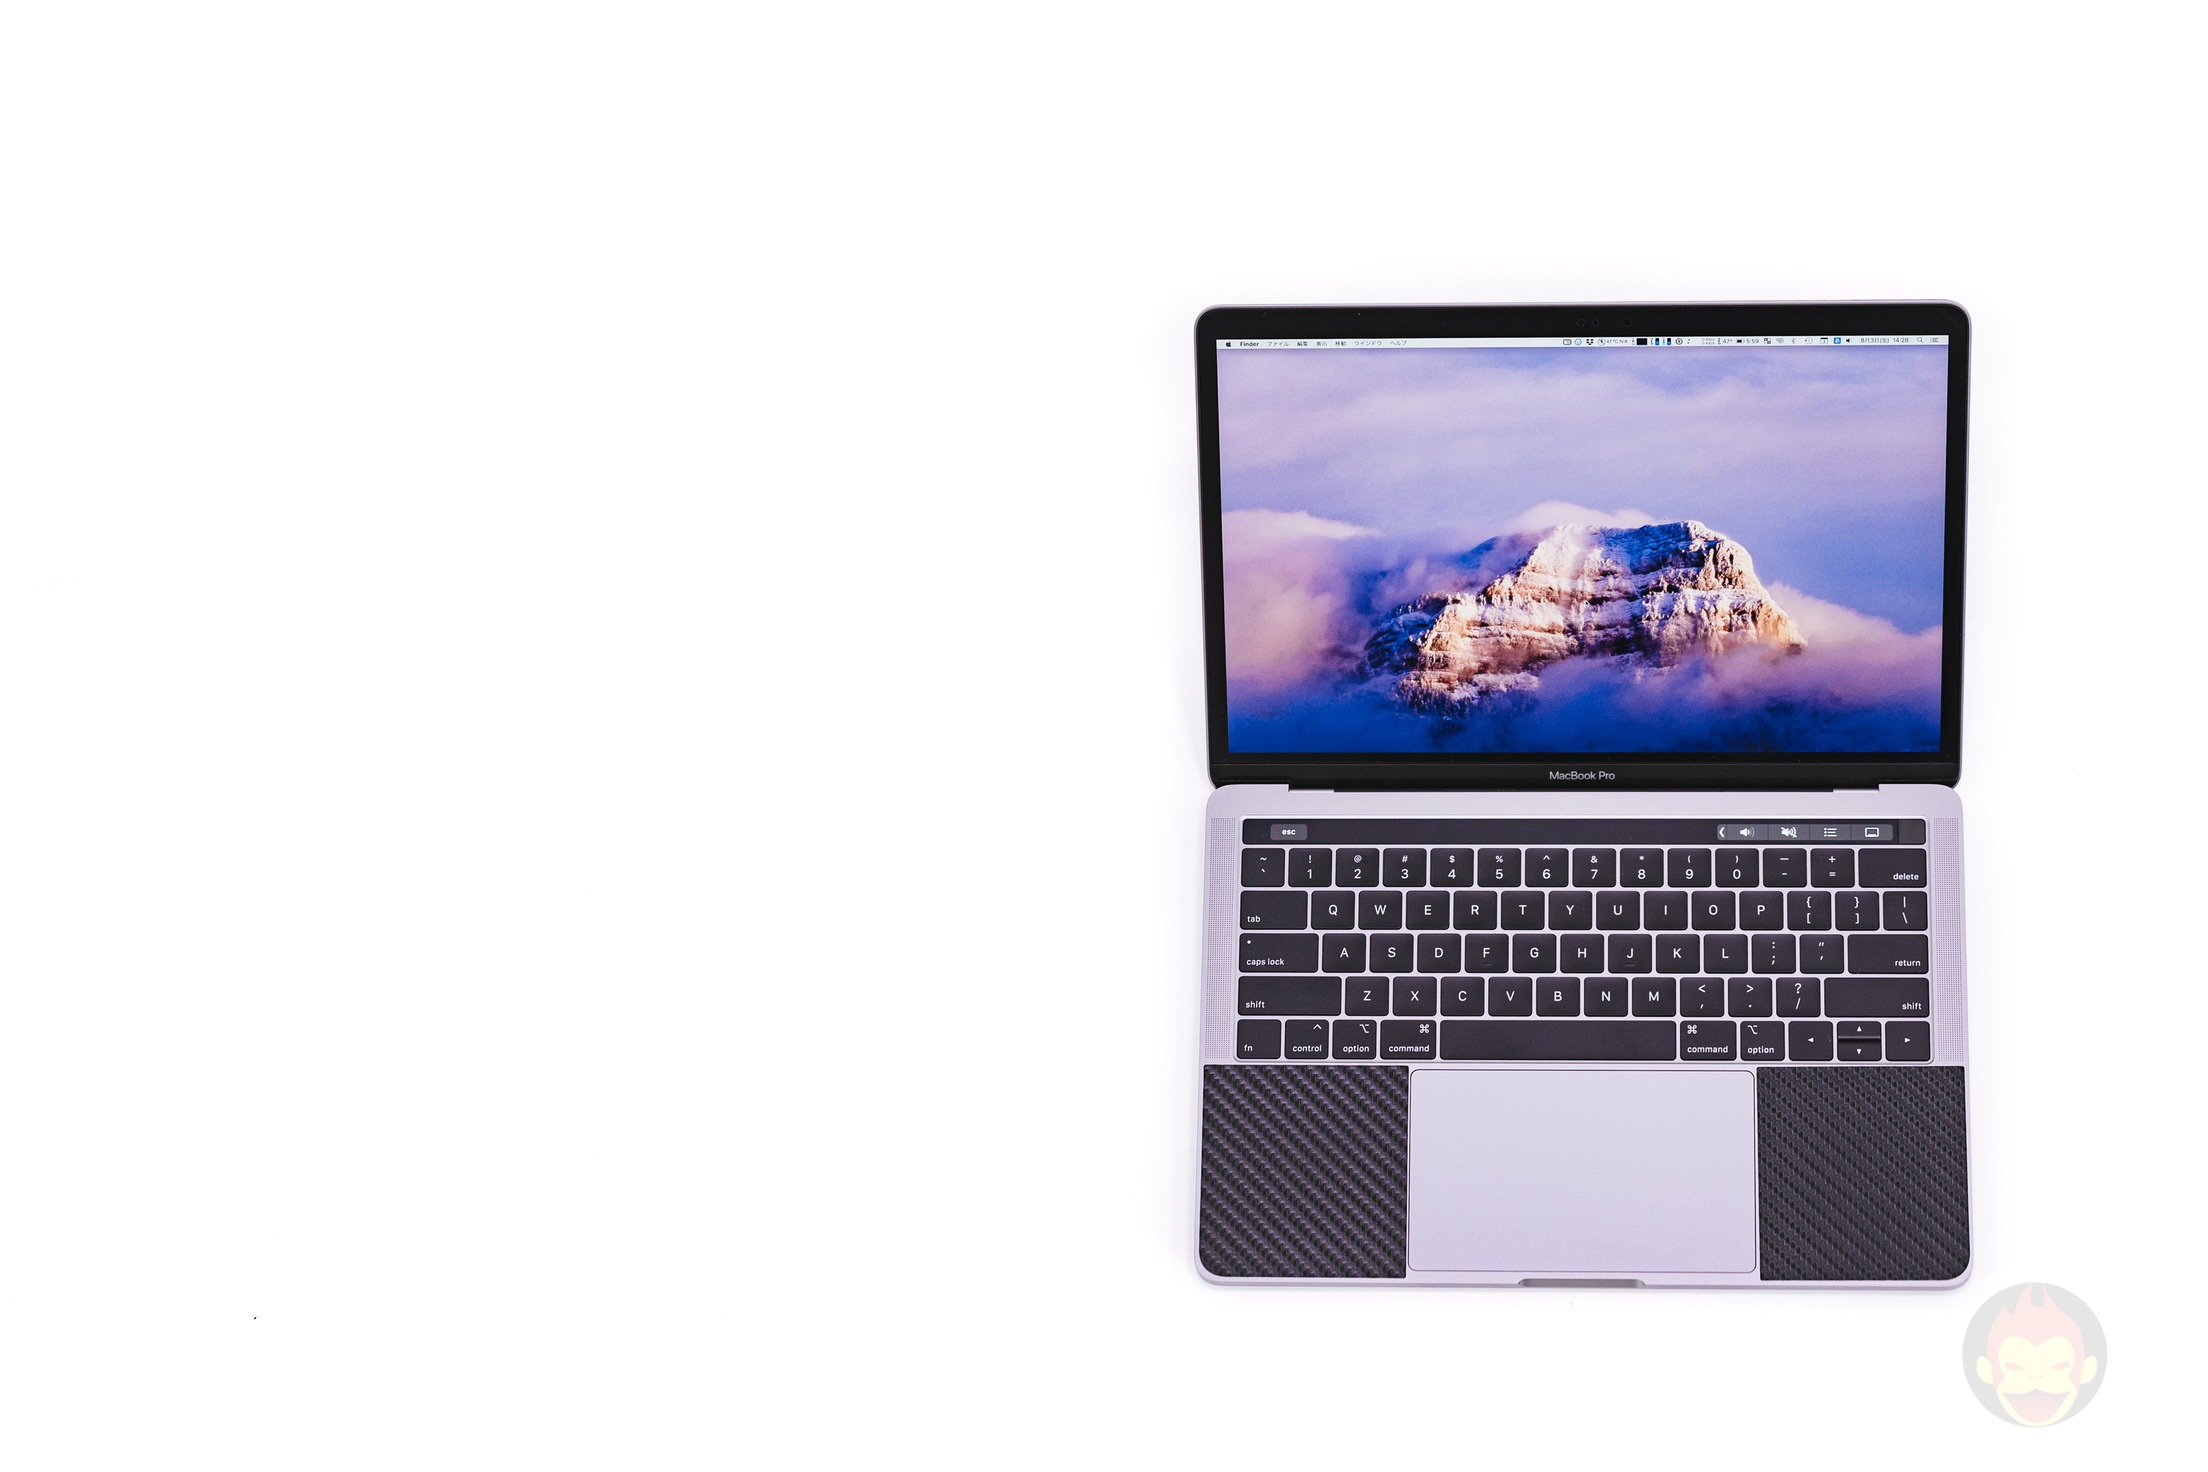 MacBook-Pro-2018-13inch-Review-09.jpg